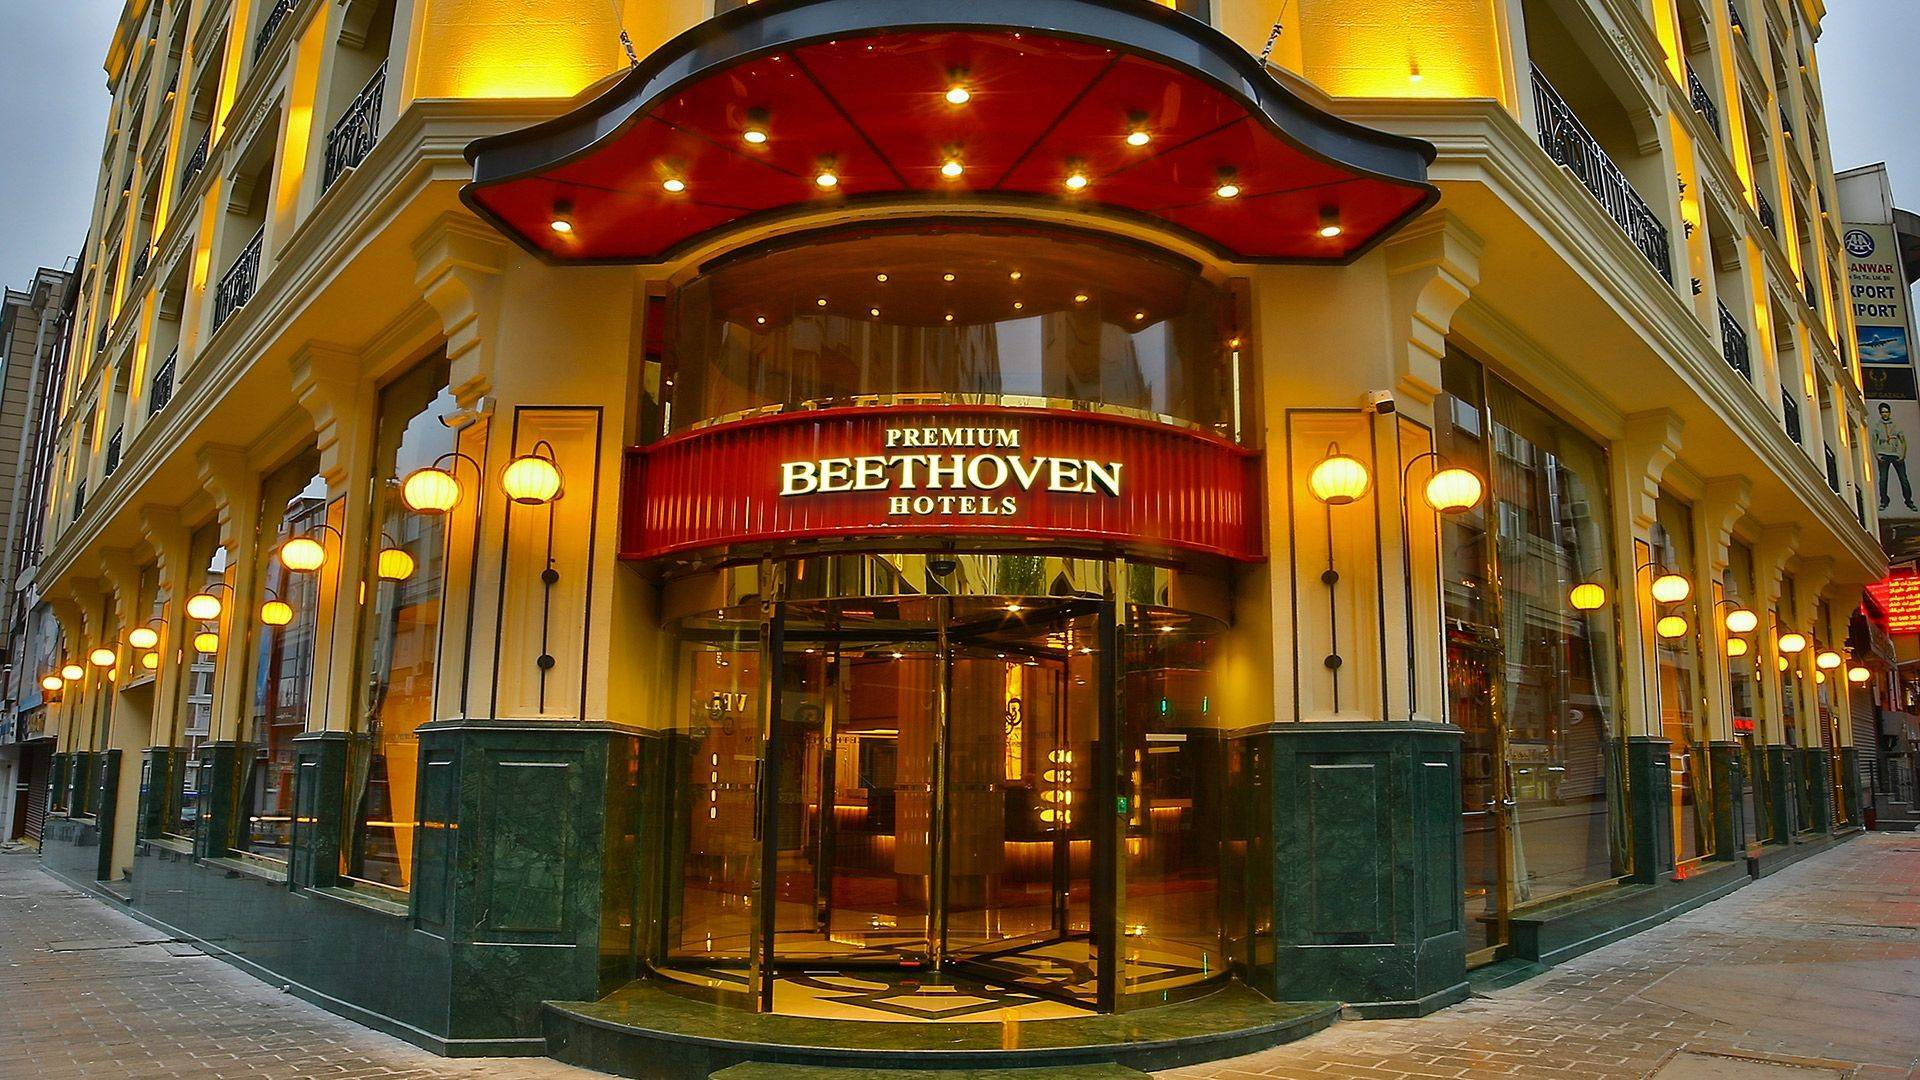 Beethoven Premium Otel, İstanbul, Laleli, 29661